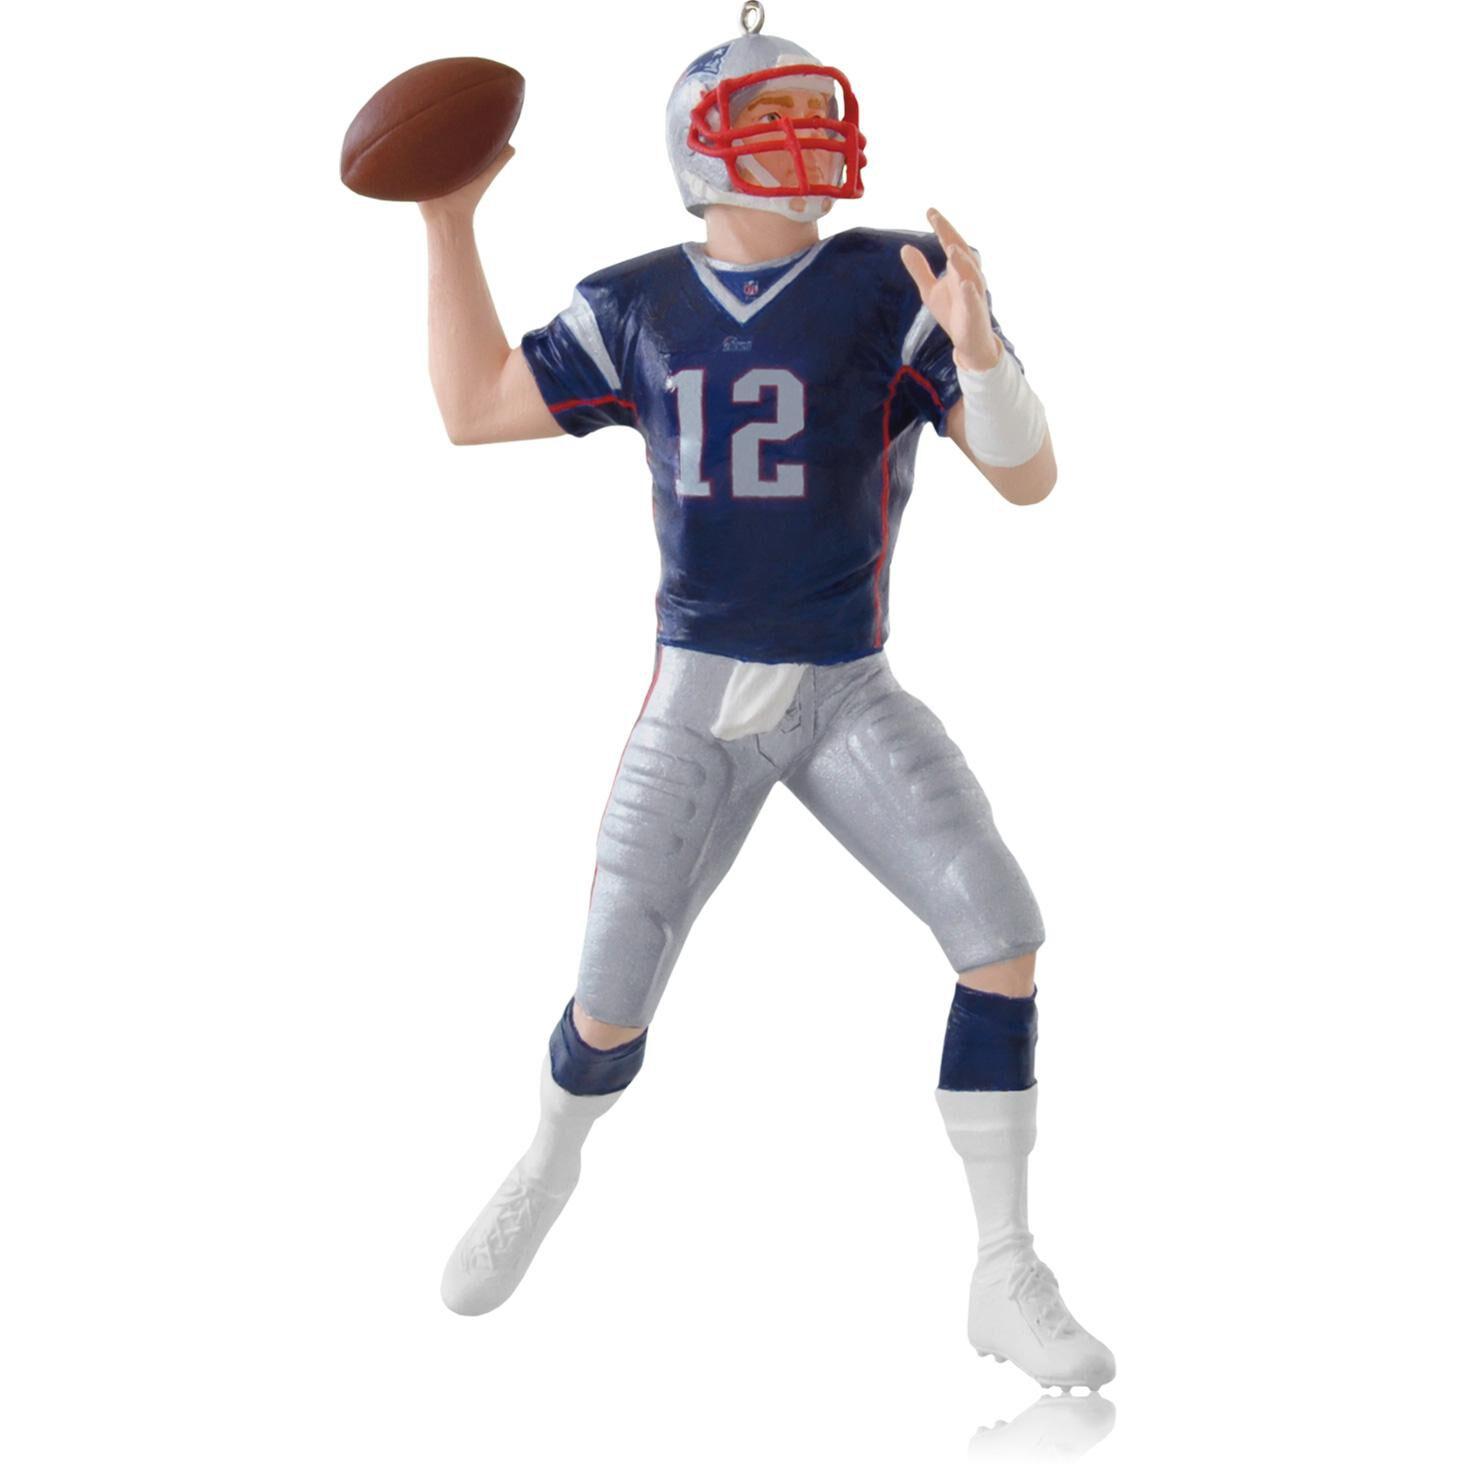 Football player ornament - Football Player Ornament 43